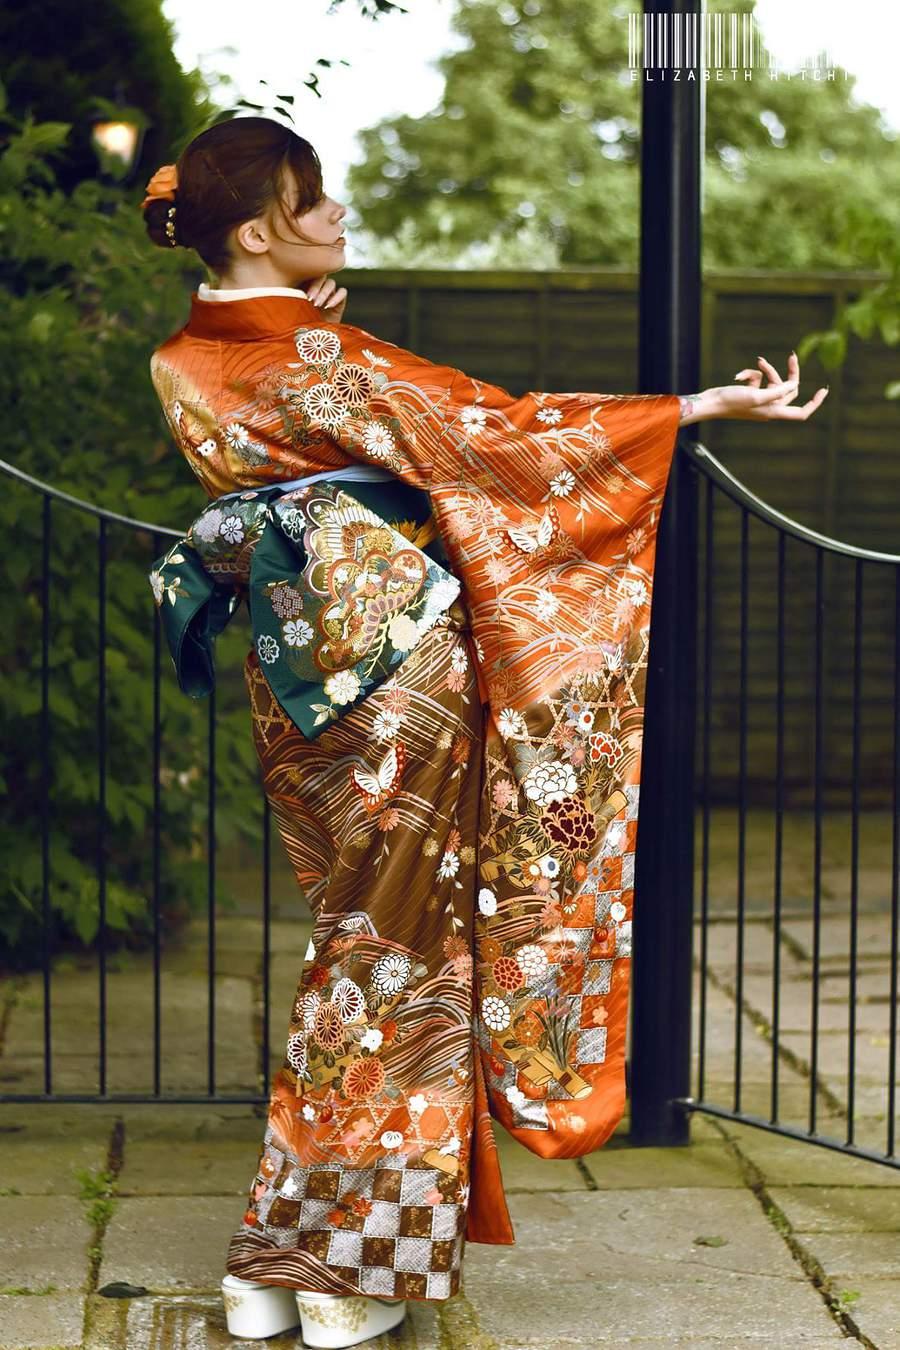 Follow me down the rabbit hole... / Photography by Kimono Stylist, Model Lolita_Ward, Makeup by Kimono Stylist, Stylist Kimono Stylist, Hair styling by Kimono Stylist / Uploaded 8th June 2017 @ 04:15 PM